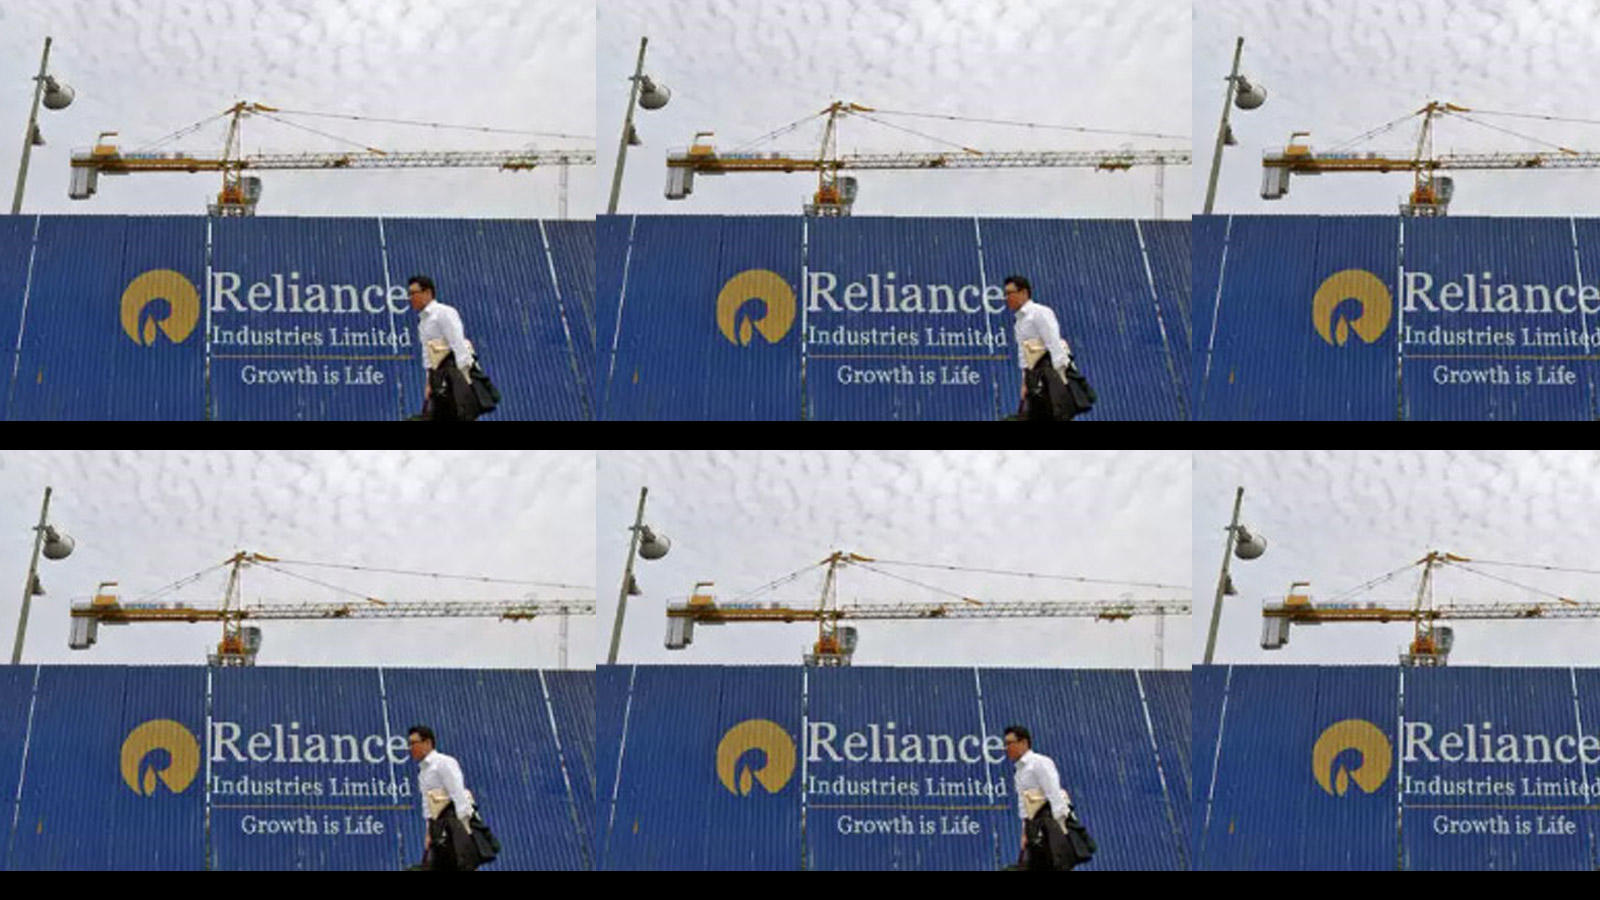 reliance-industries-limiteds-market-valuation-crosses-rs-11-5-lakh-crore-mark